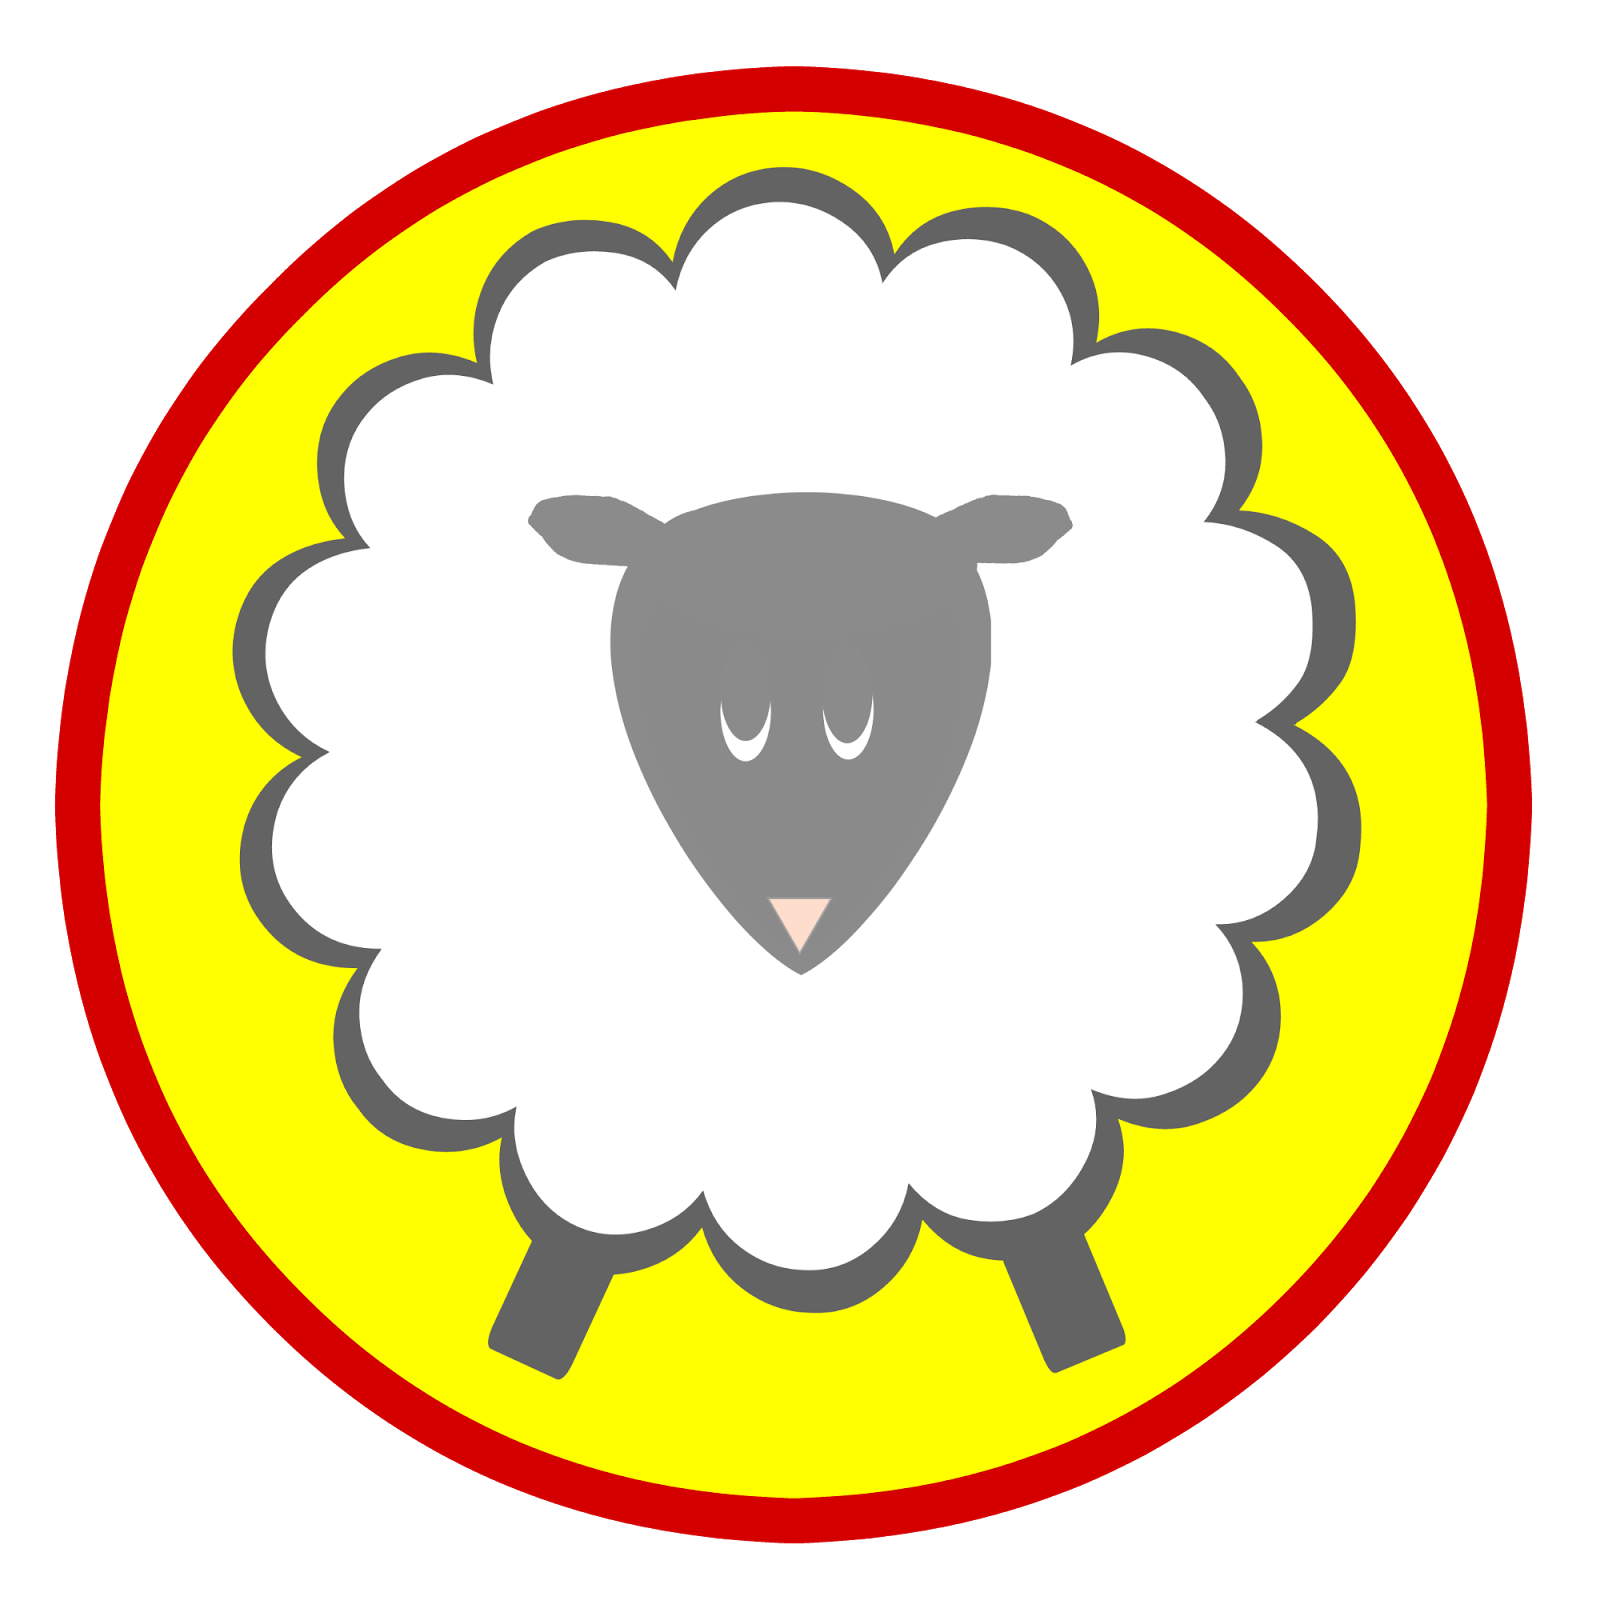 YEAR OF THE SHEEP | 2015 Tarot Forecast